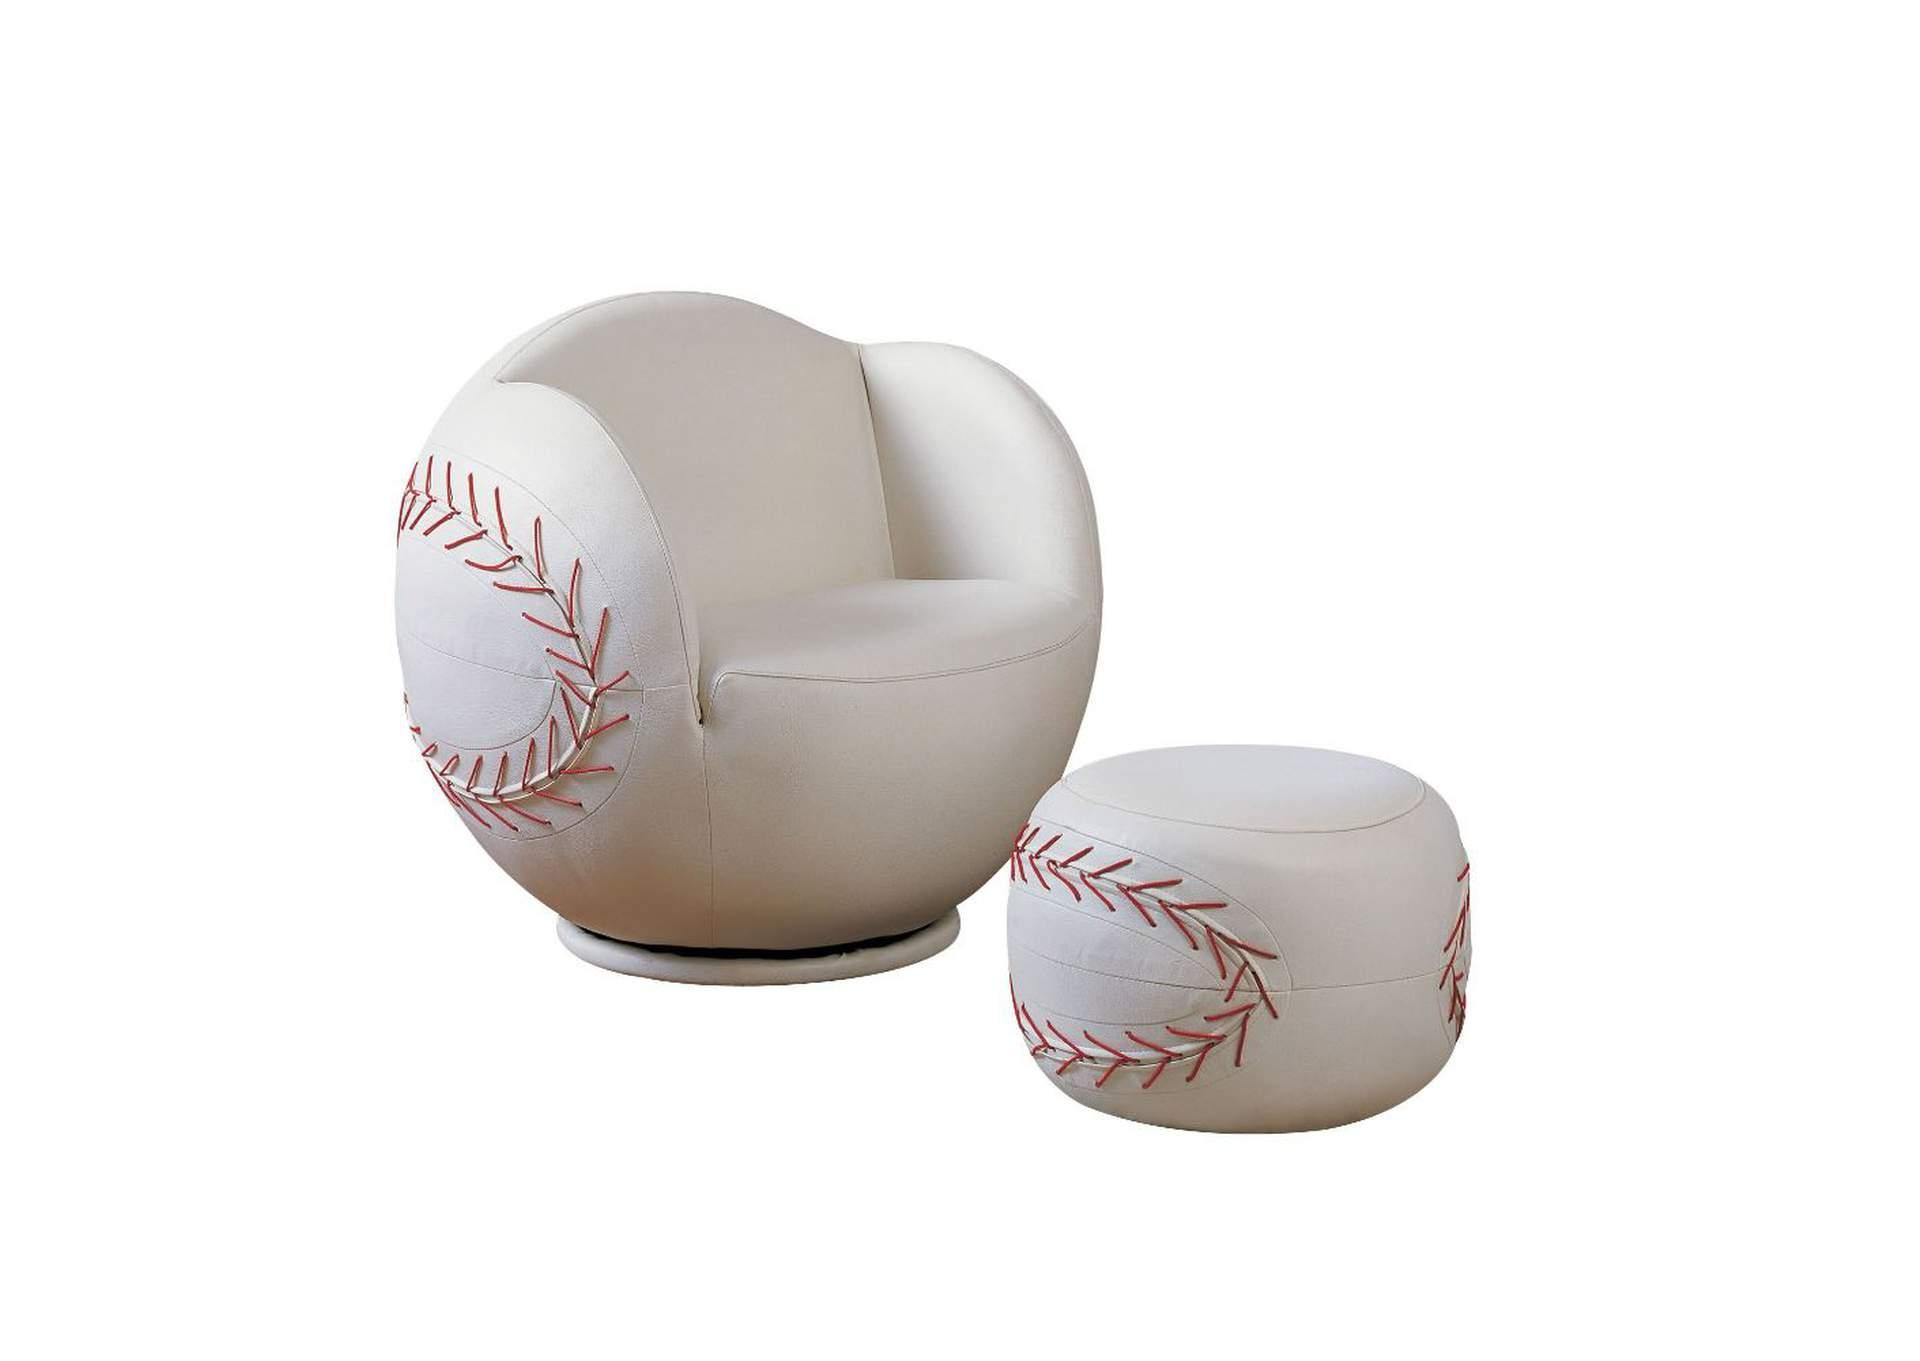 Best Buy Furniture And Mattress All Star Baseball White Chair Ottoman